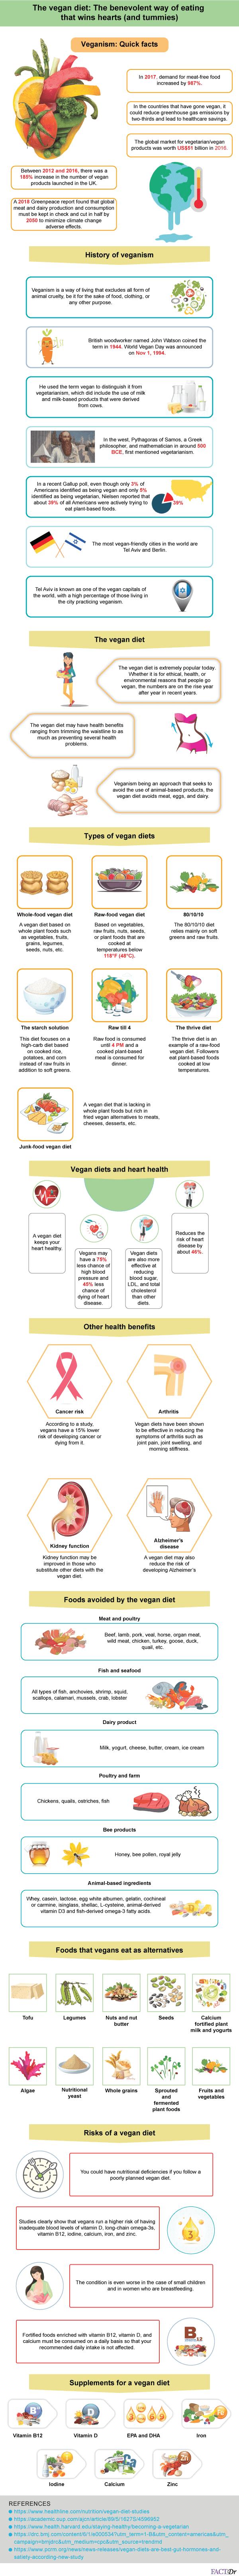 vegan diet infographic